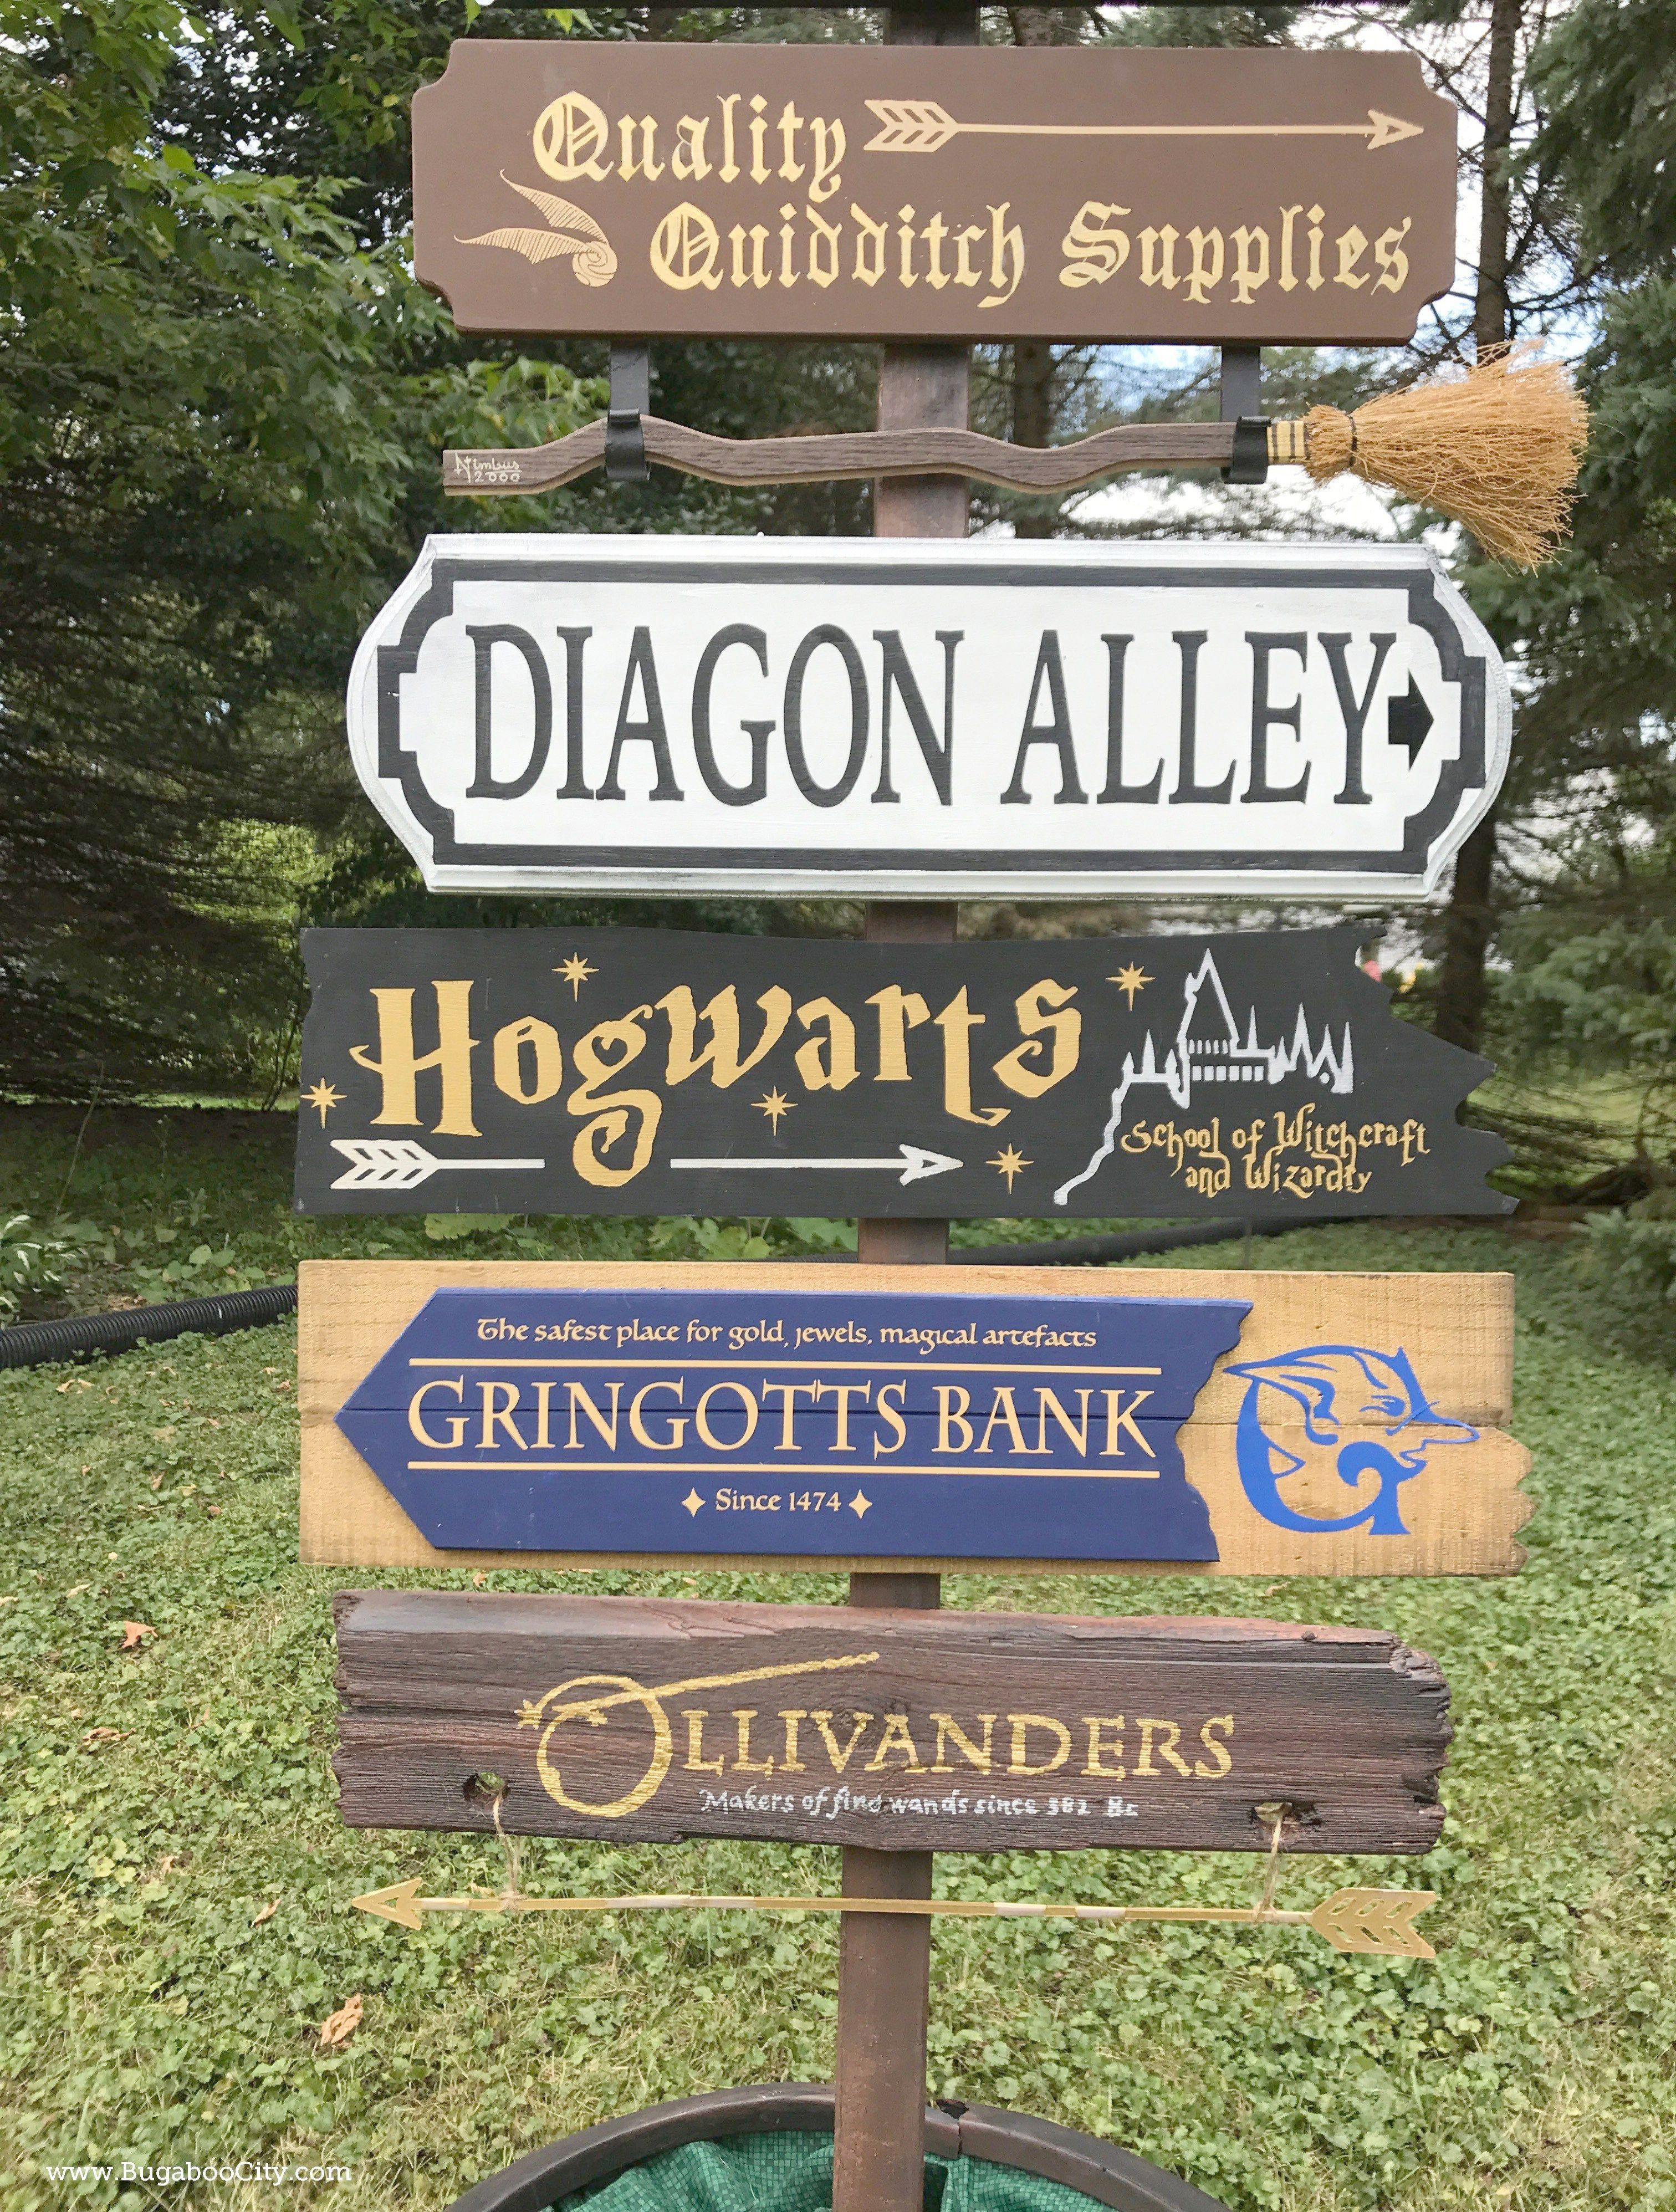 Harry Potter Wizards Unite Name Via Harry Potter House Quiz Nytimes This Harry Potter Wizards Anniversaire Harry Potter Mariage Harry Potter Anniversaire Harry